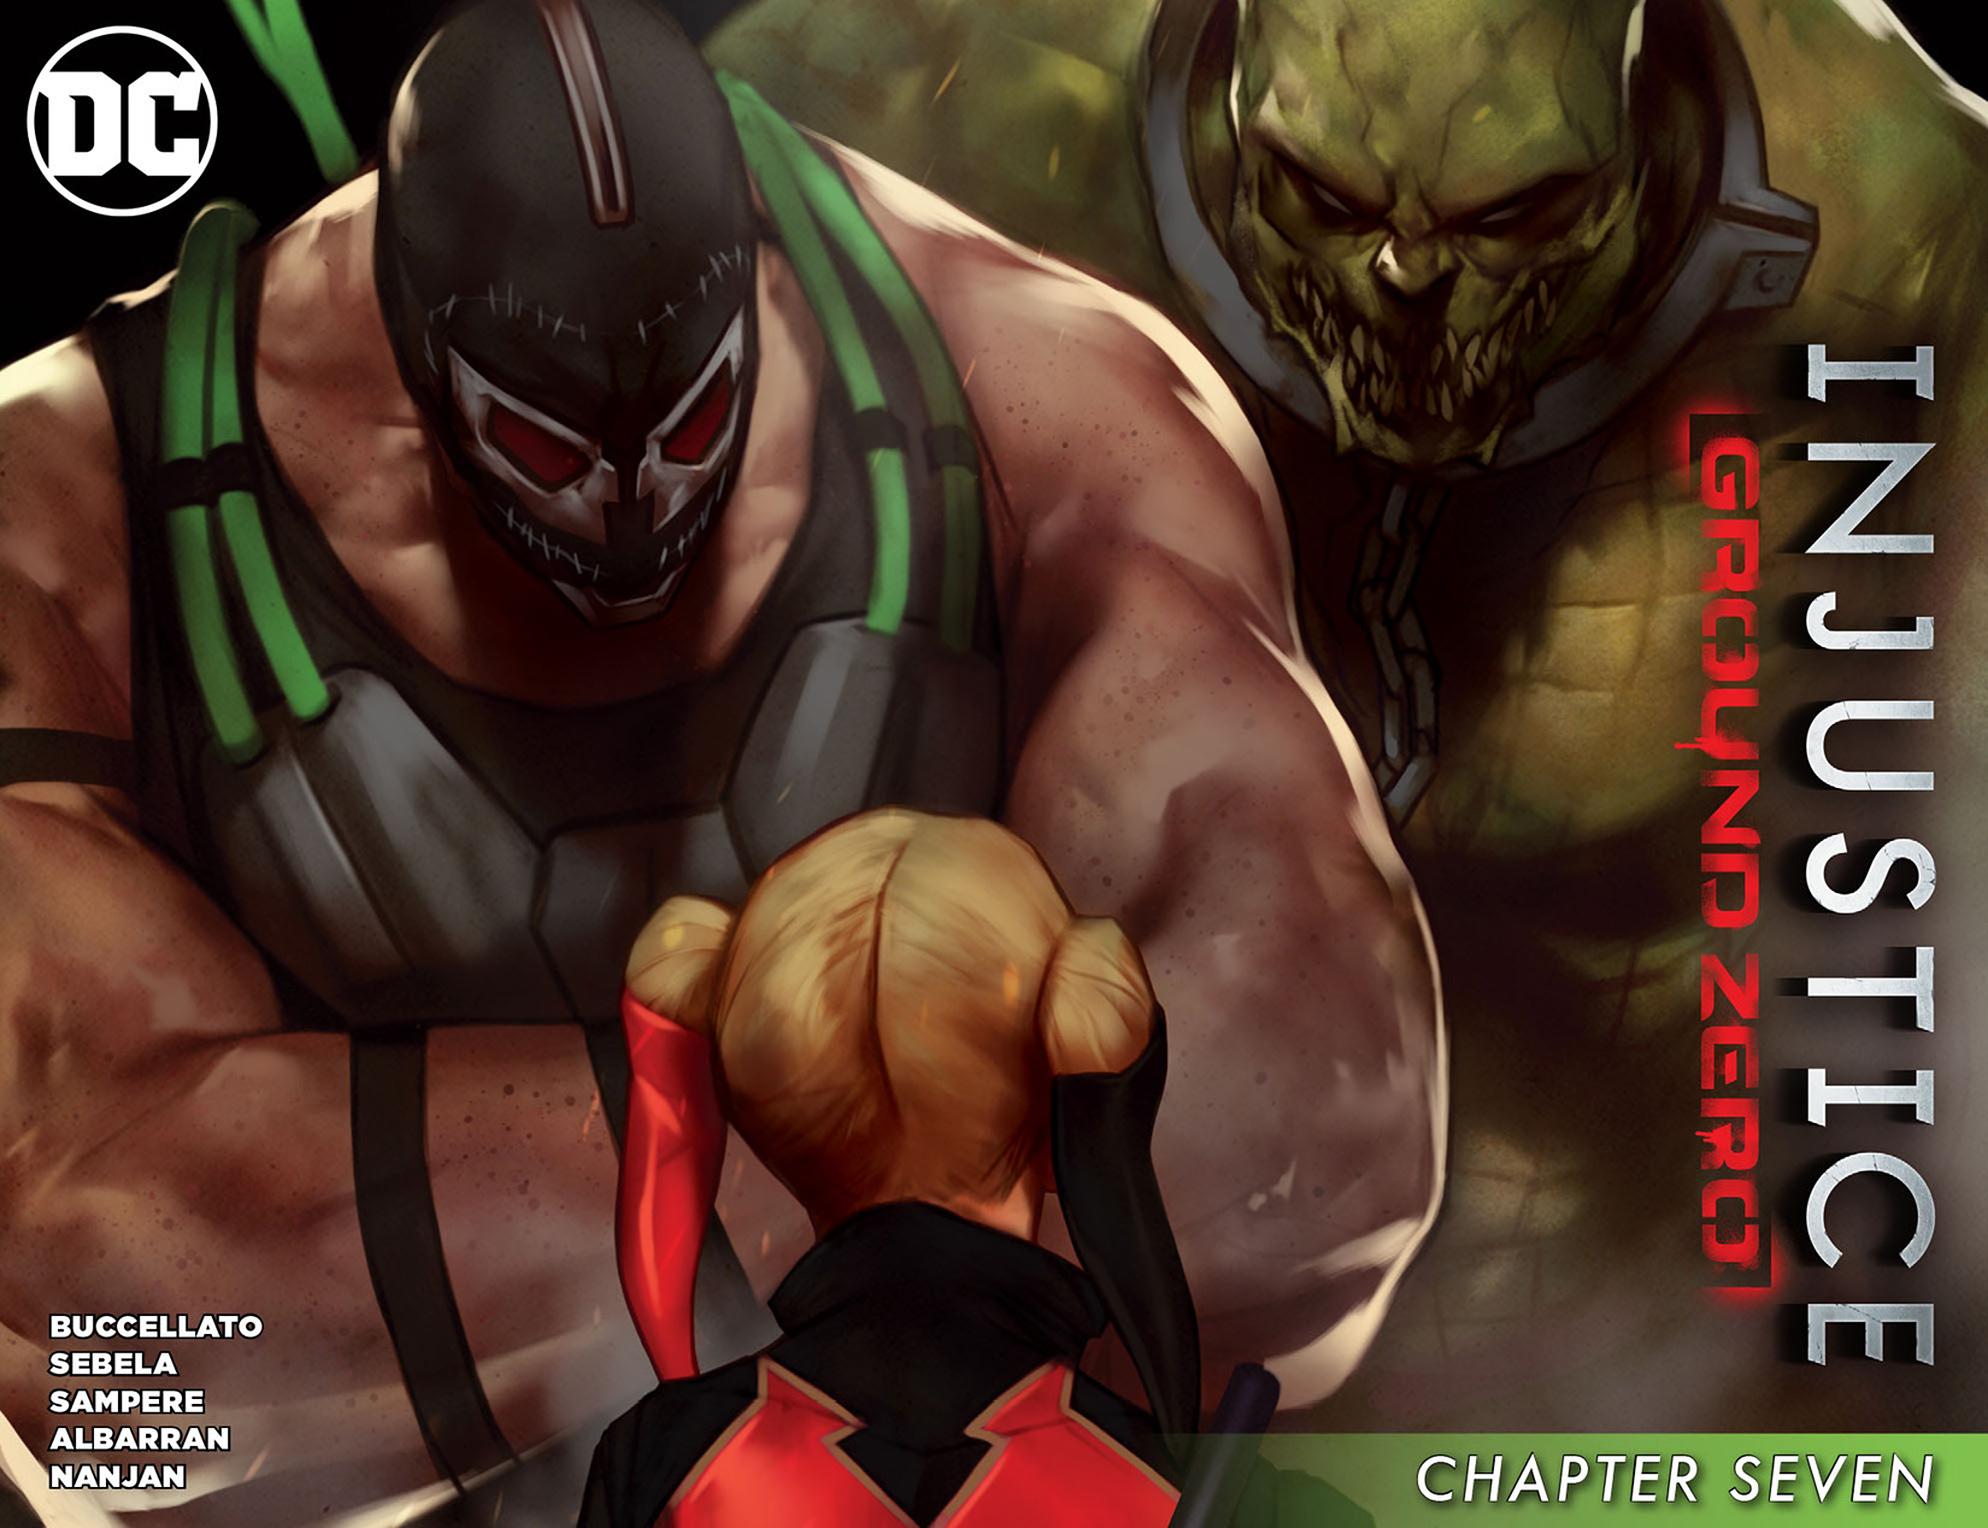 Read online Injustice: Ground Zero comic -  Issue #7 - 1